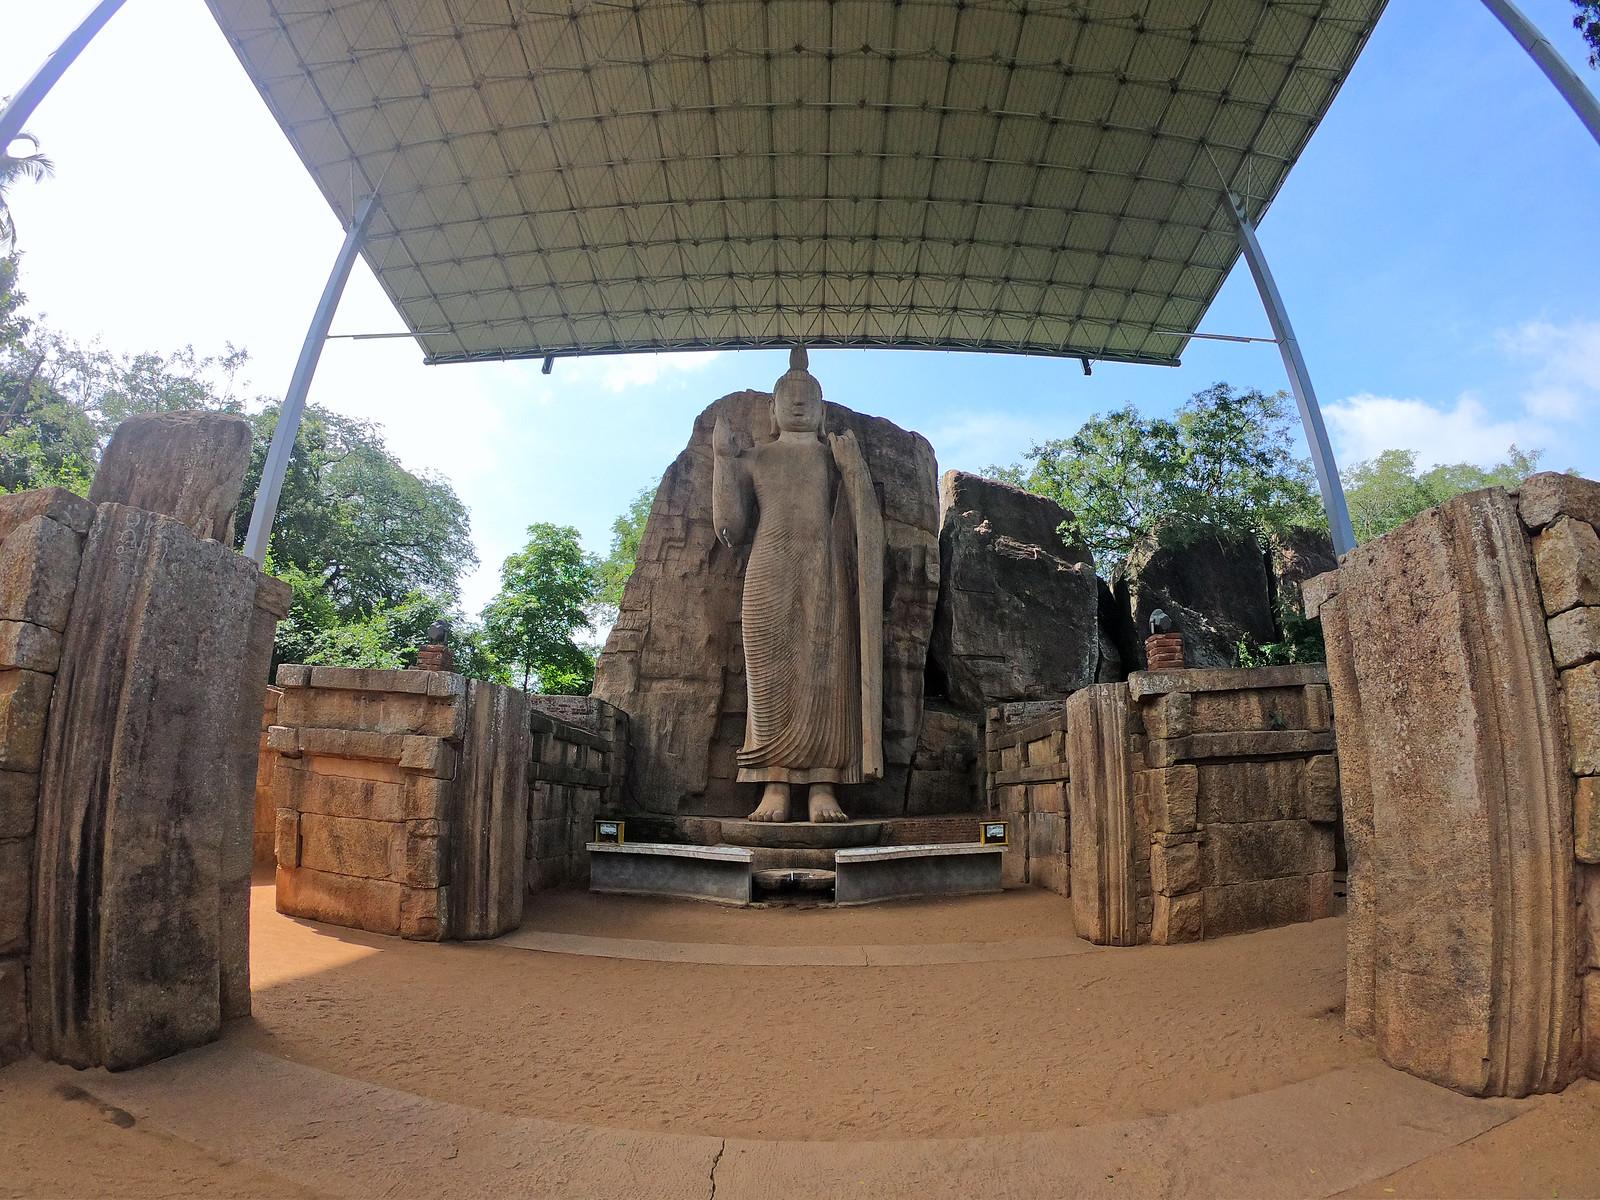 Aukana, la estatua de Buda más alta de Sri Lanka buda de aukana - 46728901592 927bcbd11b h - Buda de Aukana, la estatua de Buda más alta de Sri Lanka